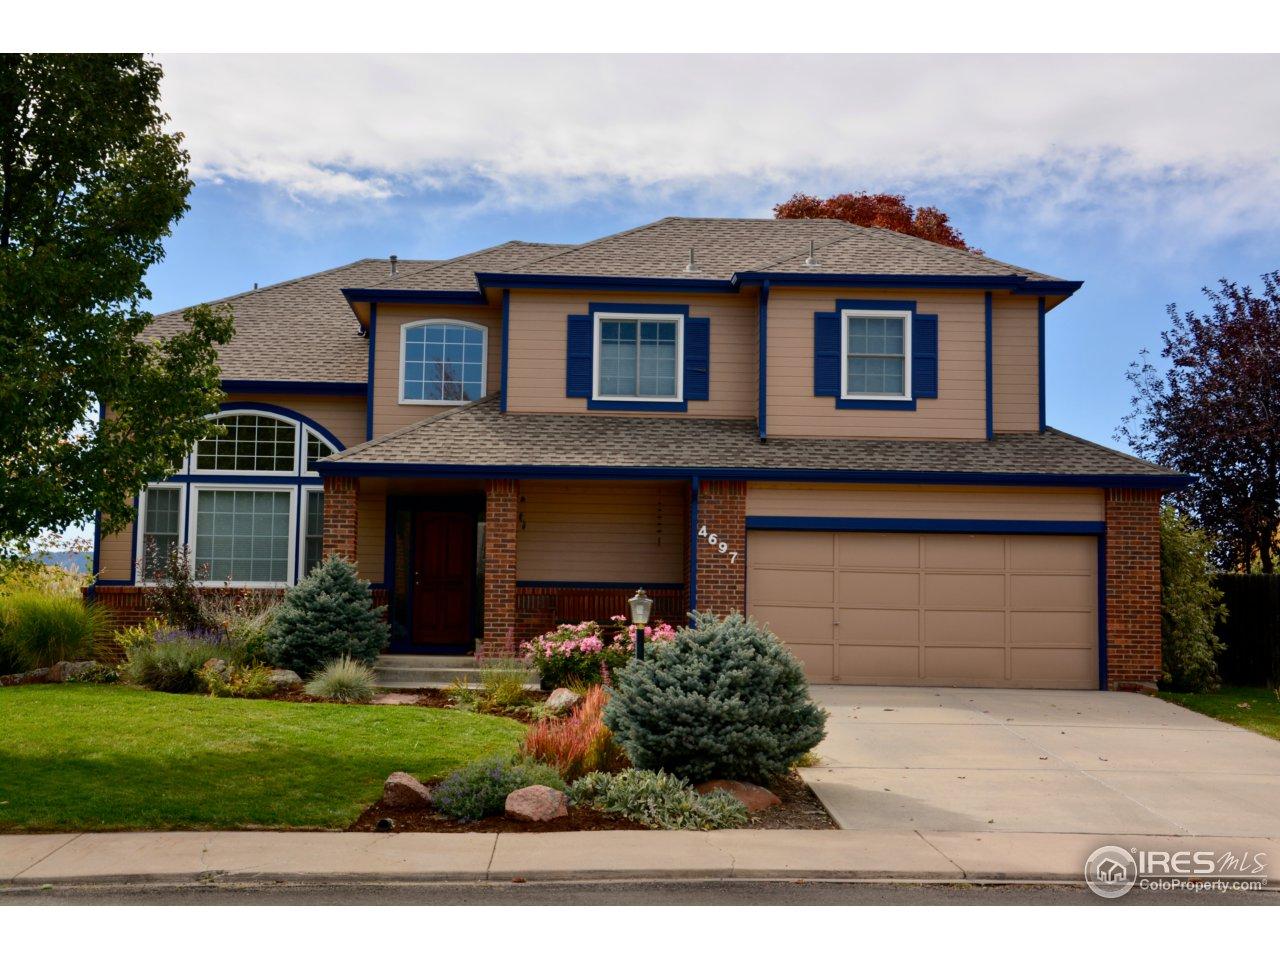 4697 Tally Ho Ct, Boulder CO 80301